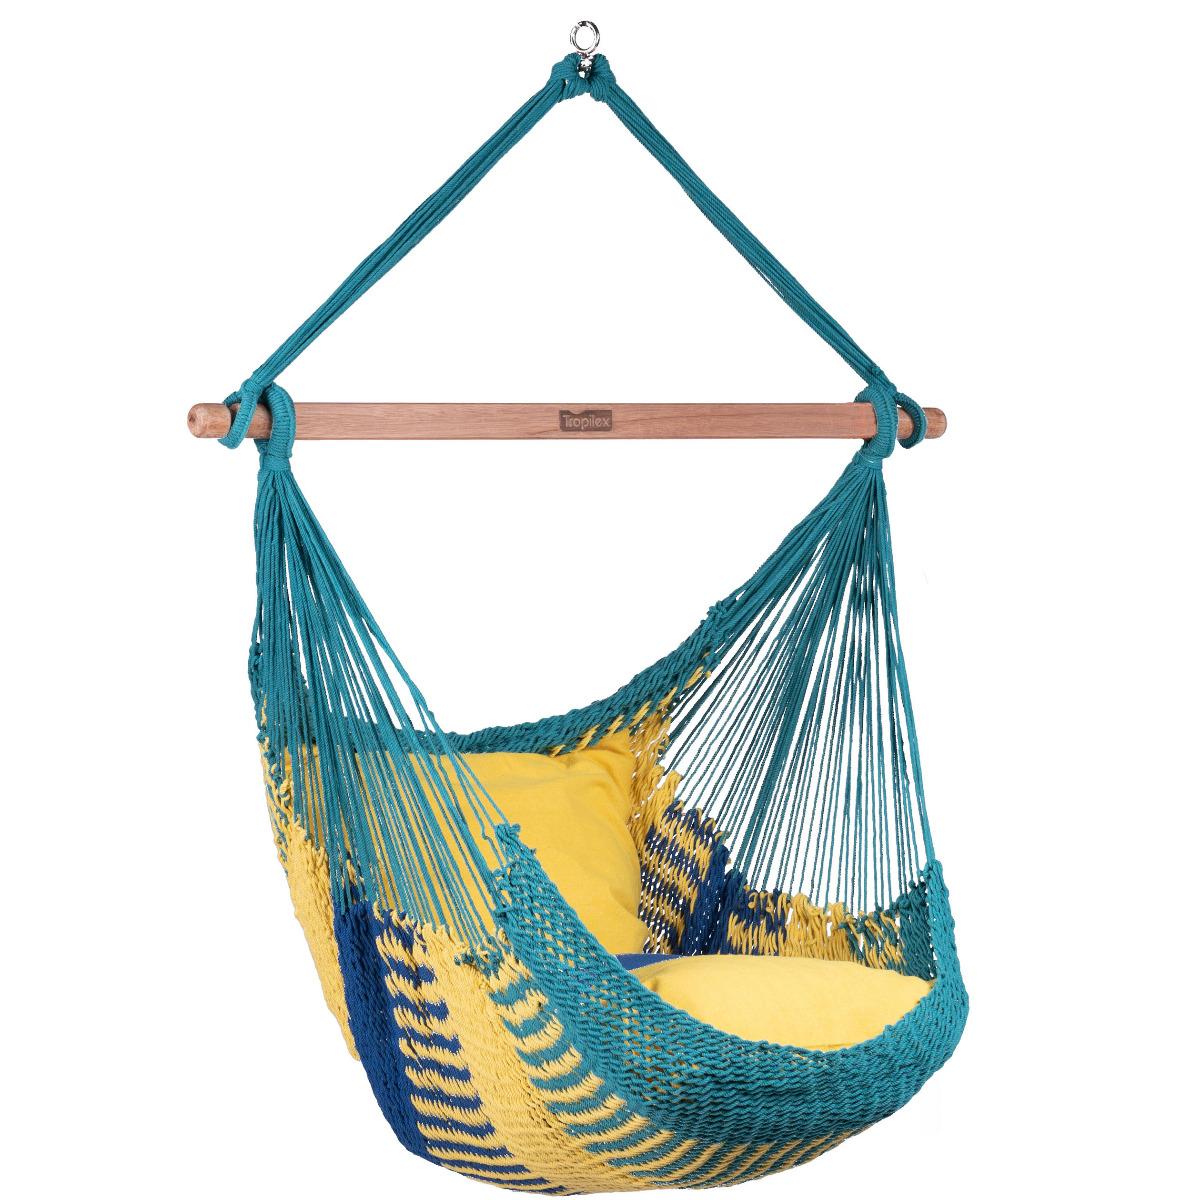 Hangstoel 'Mexico' Tropic - Tropilex �